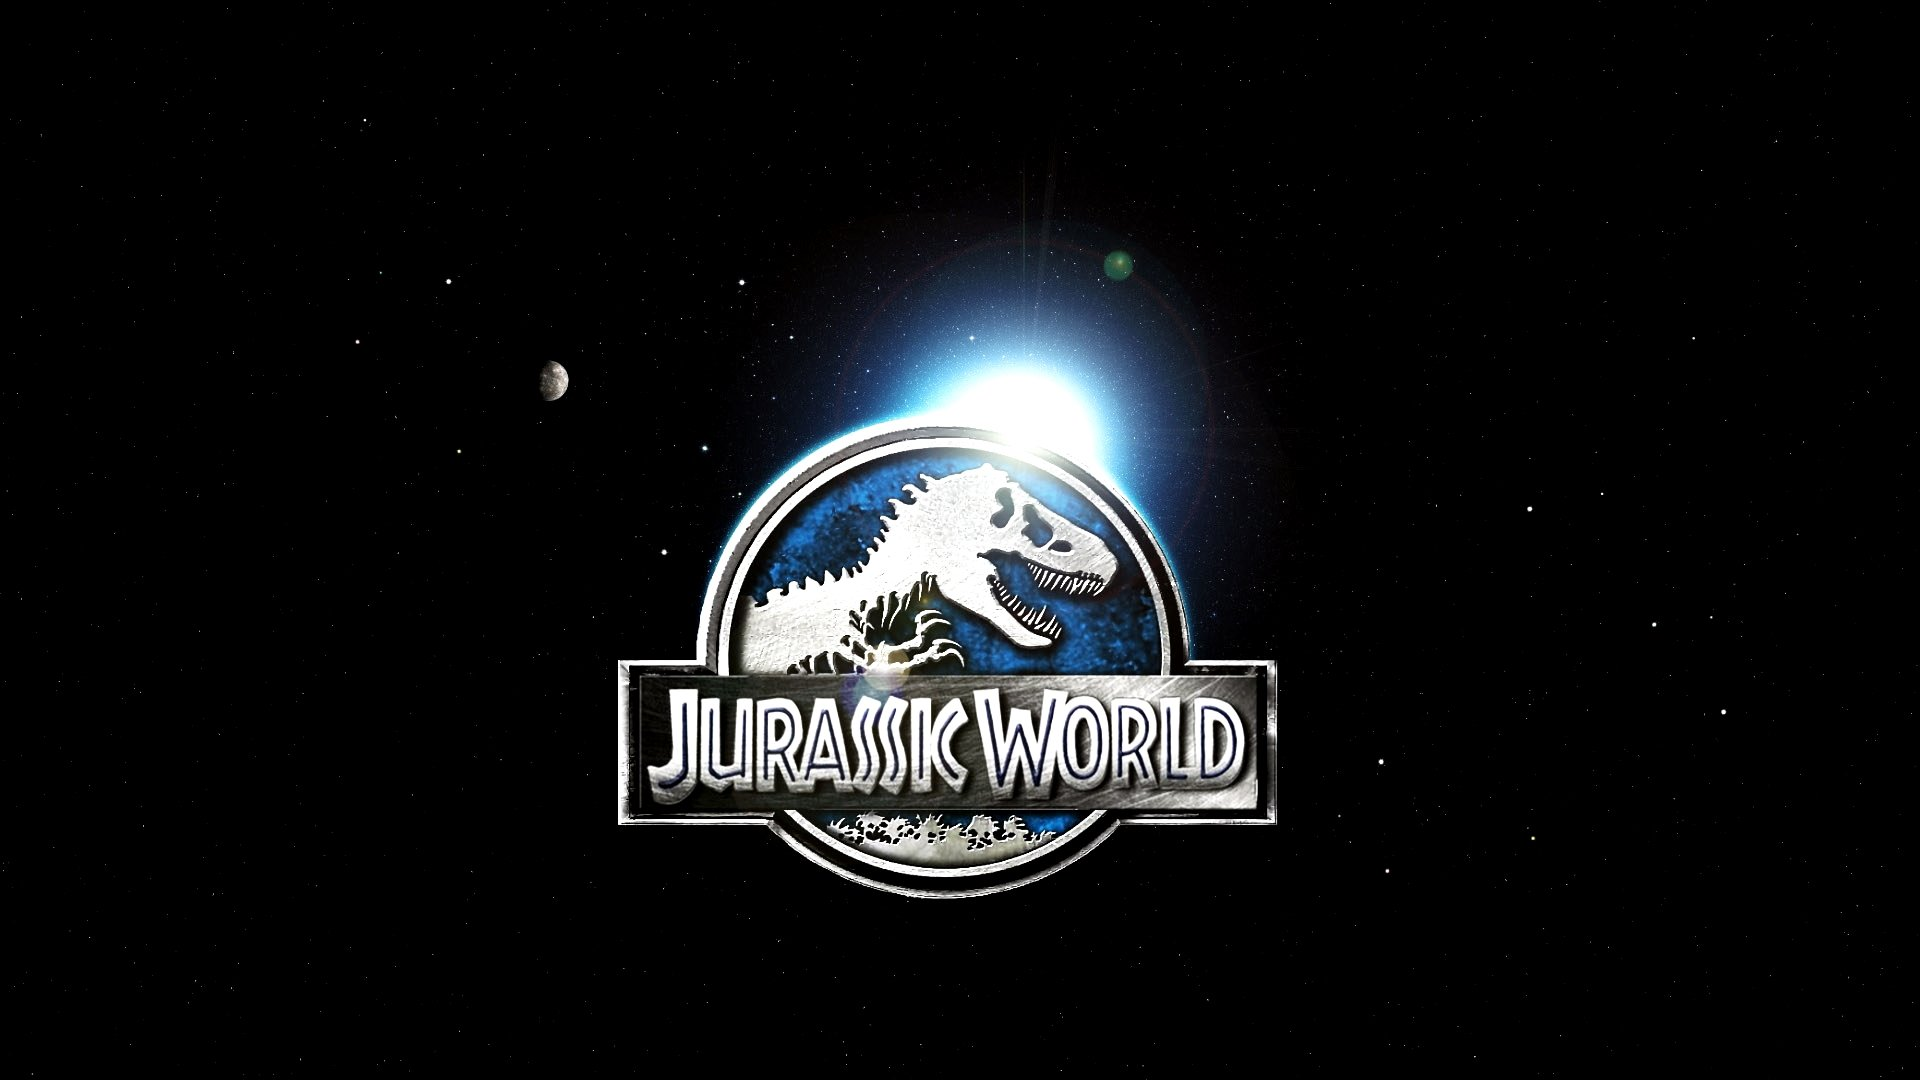 Jurassic World Desktop Wallpapers